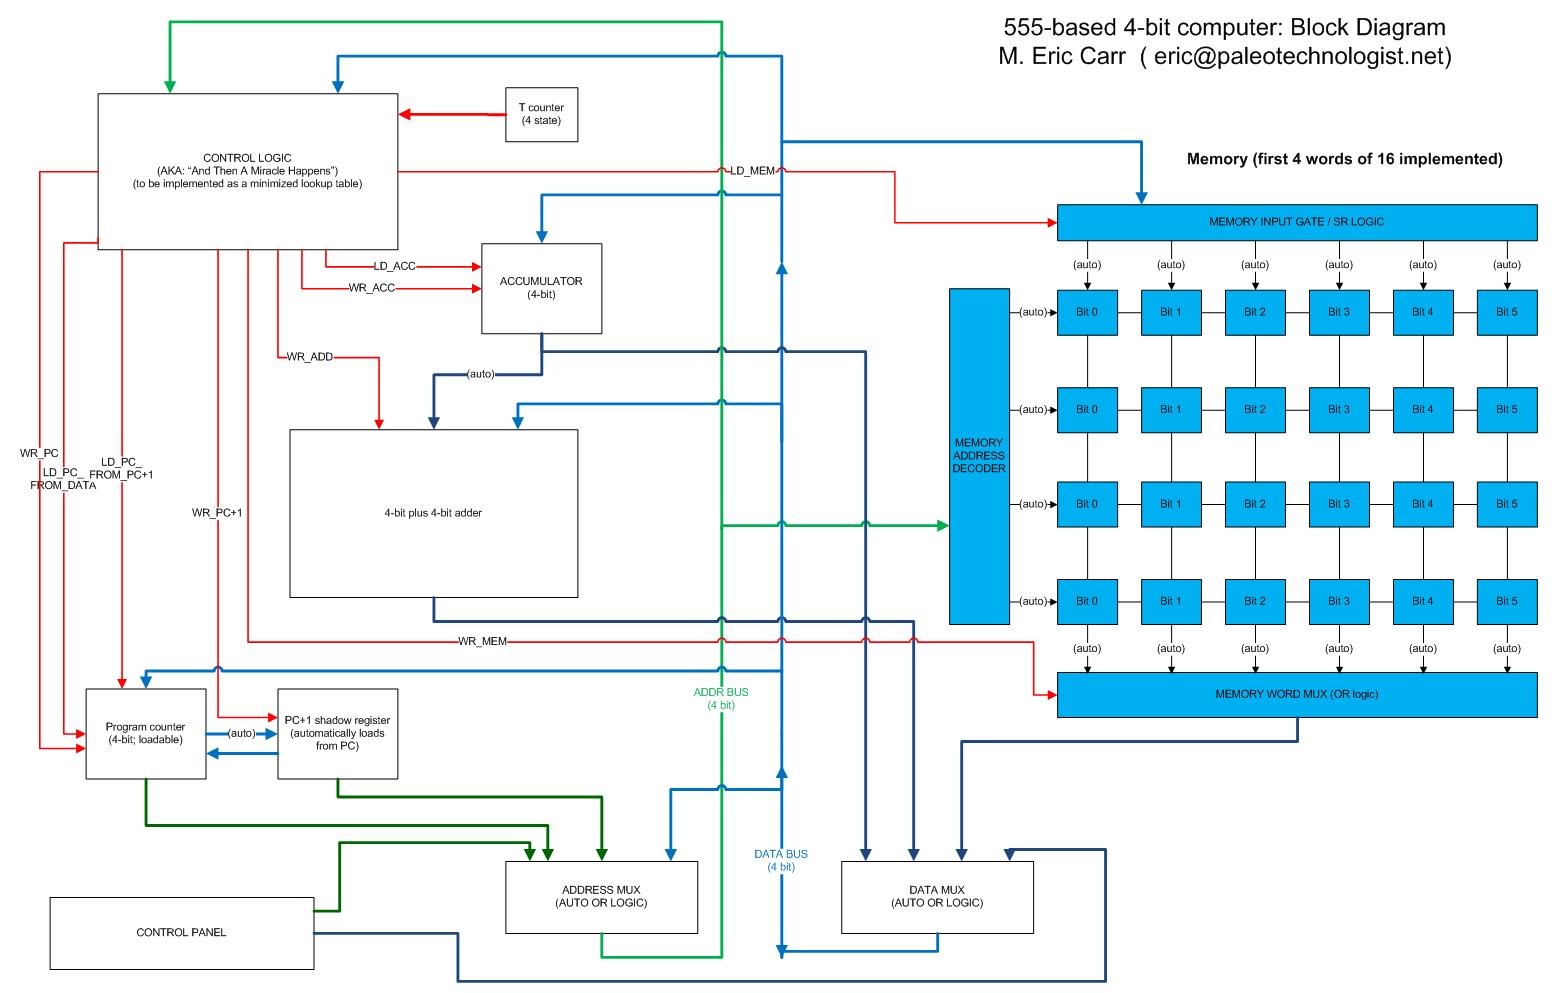 Internal Puter Parts Diagram Car Parts And Wiring Diagram Images – Labeled Car Engine Part Diagram